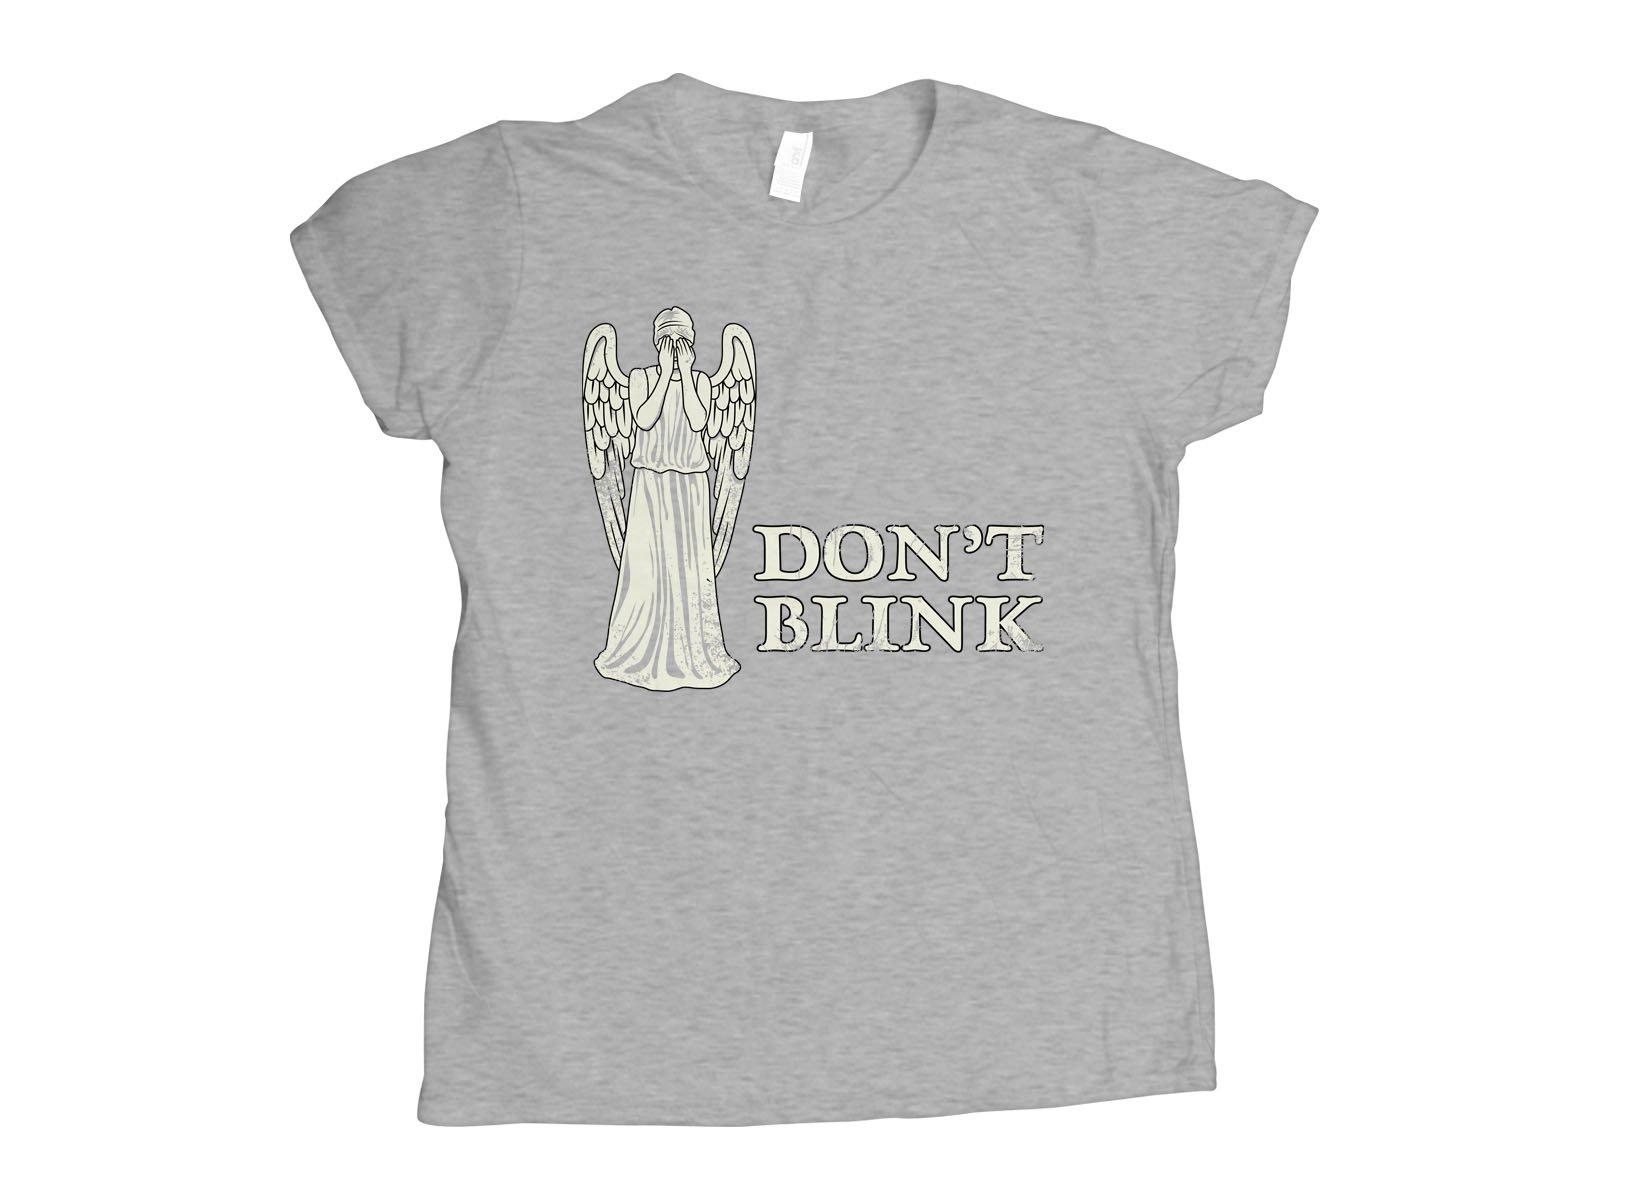 Don't Blink on Womens T-Shirt